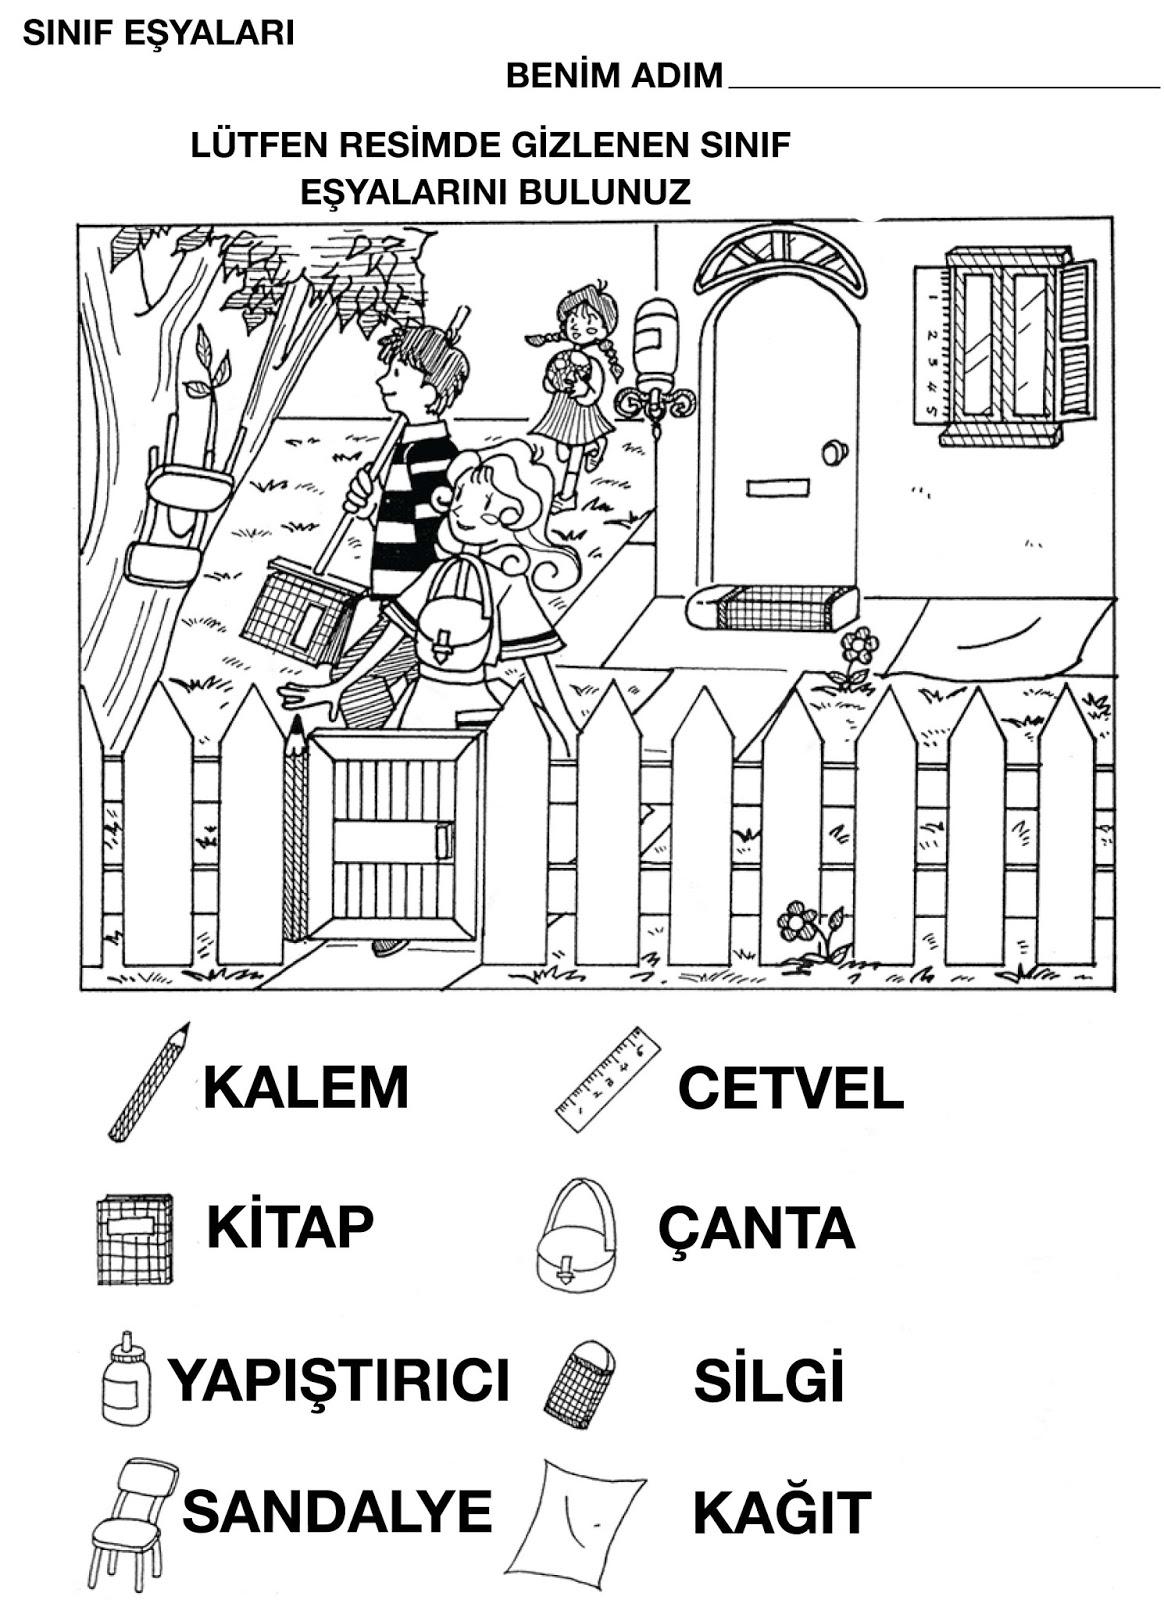 Kindergarten Turkish Language Class Sinif Esyalari